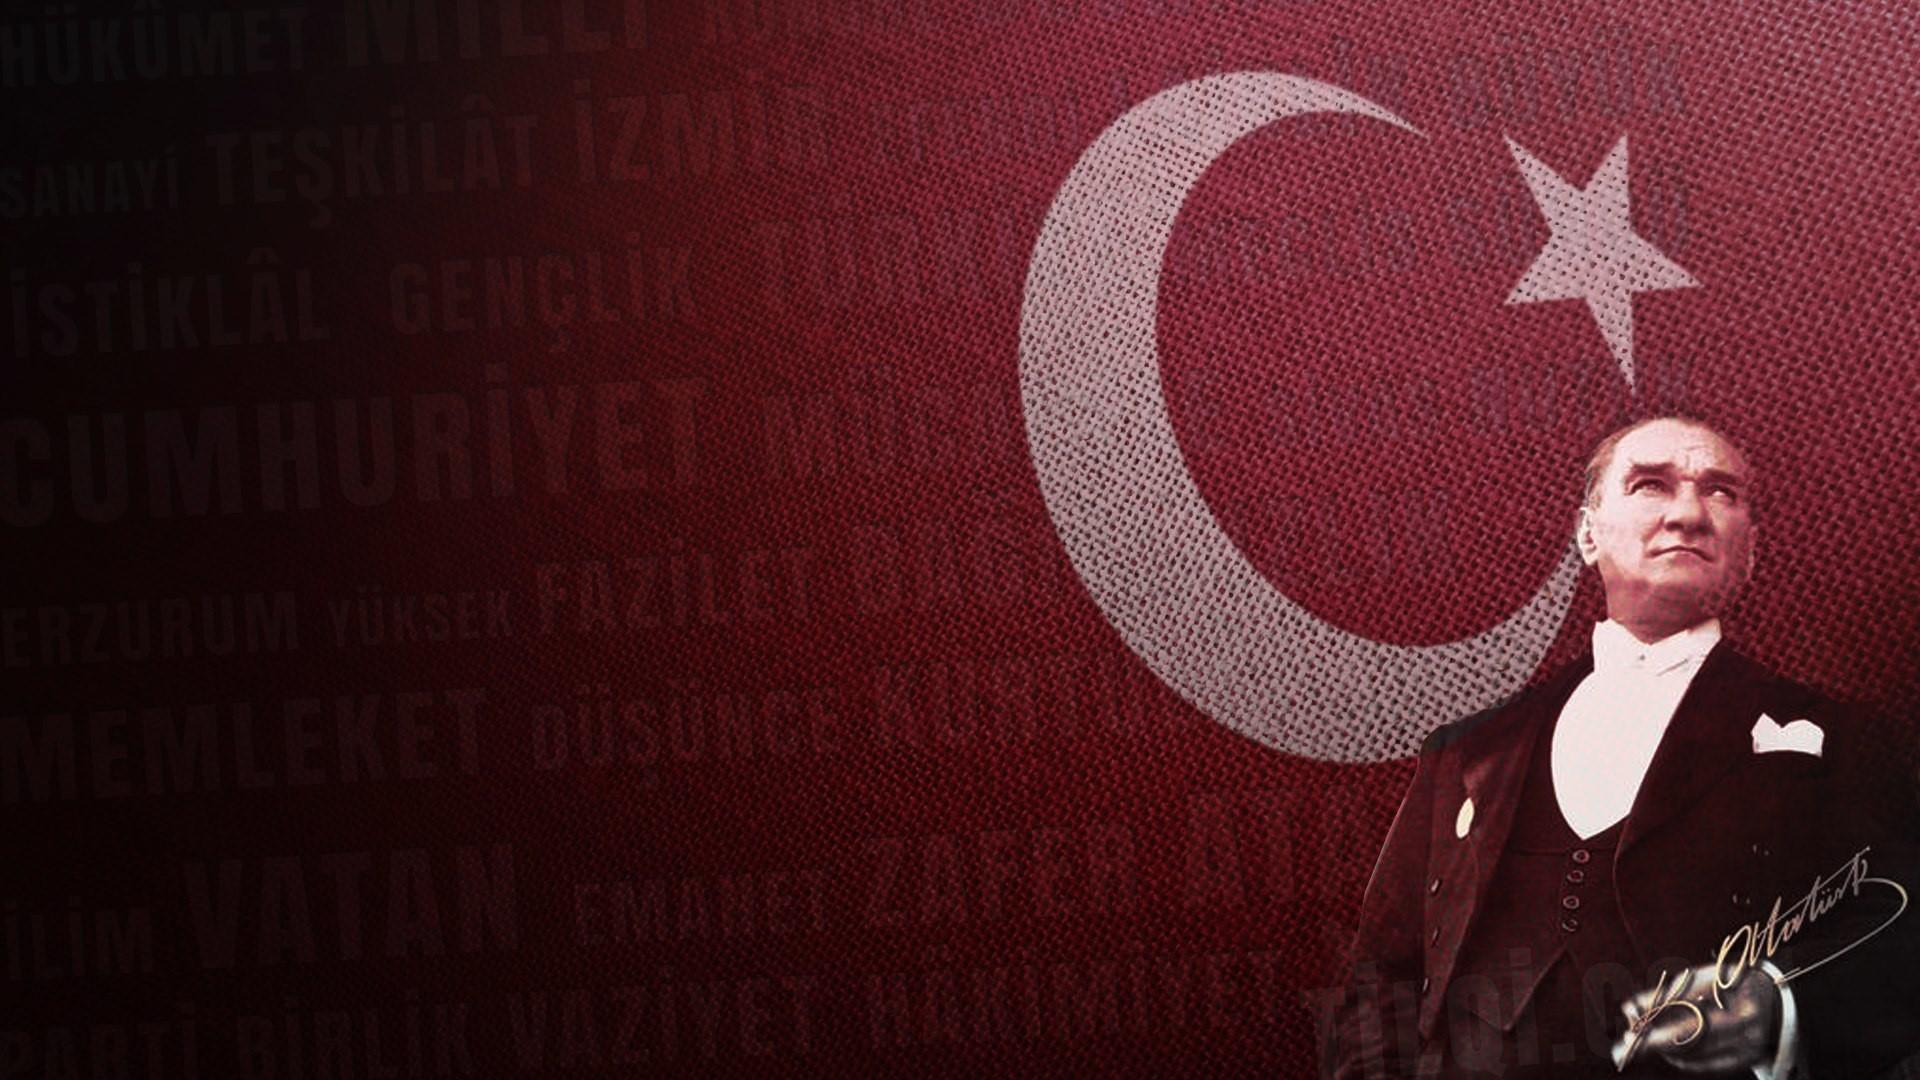 Turk mankenler ve cibl resim galeri think, that